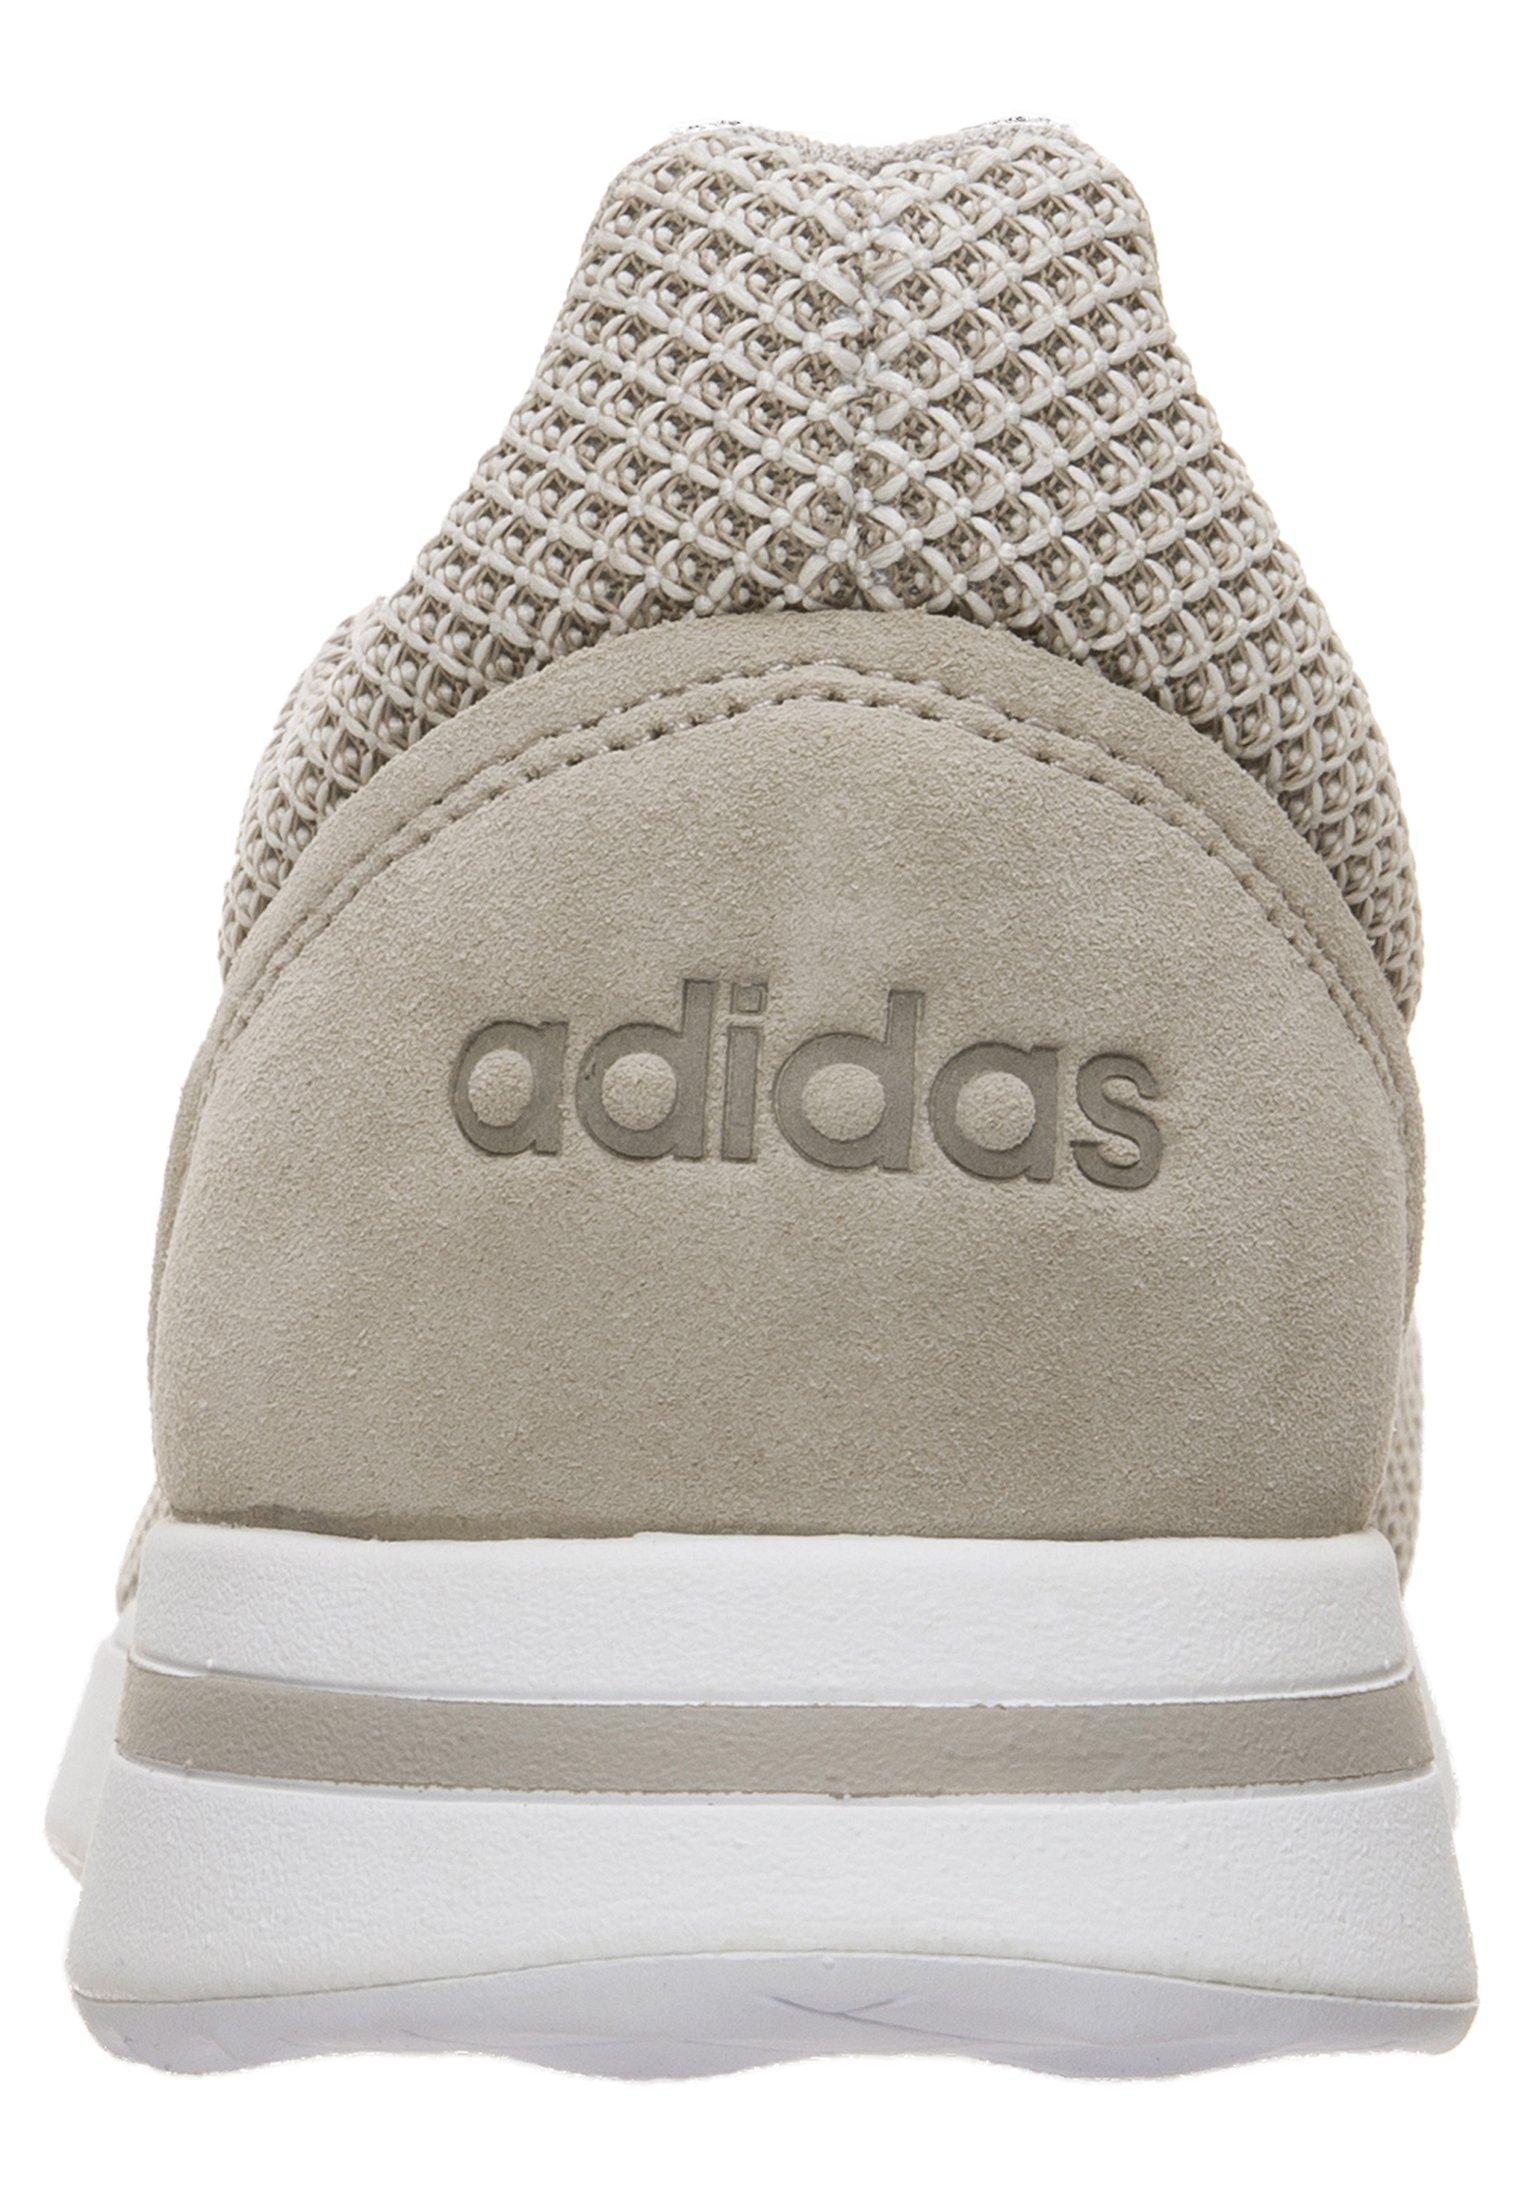 Geringster Preis adidas Originals RUN70S  - Sneaker low - light brown | Damenbekleidung 2020